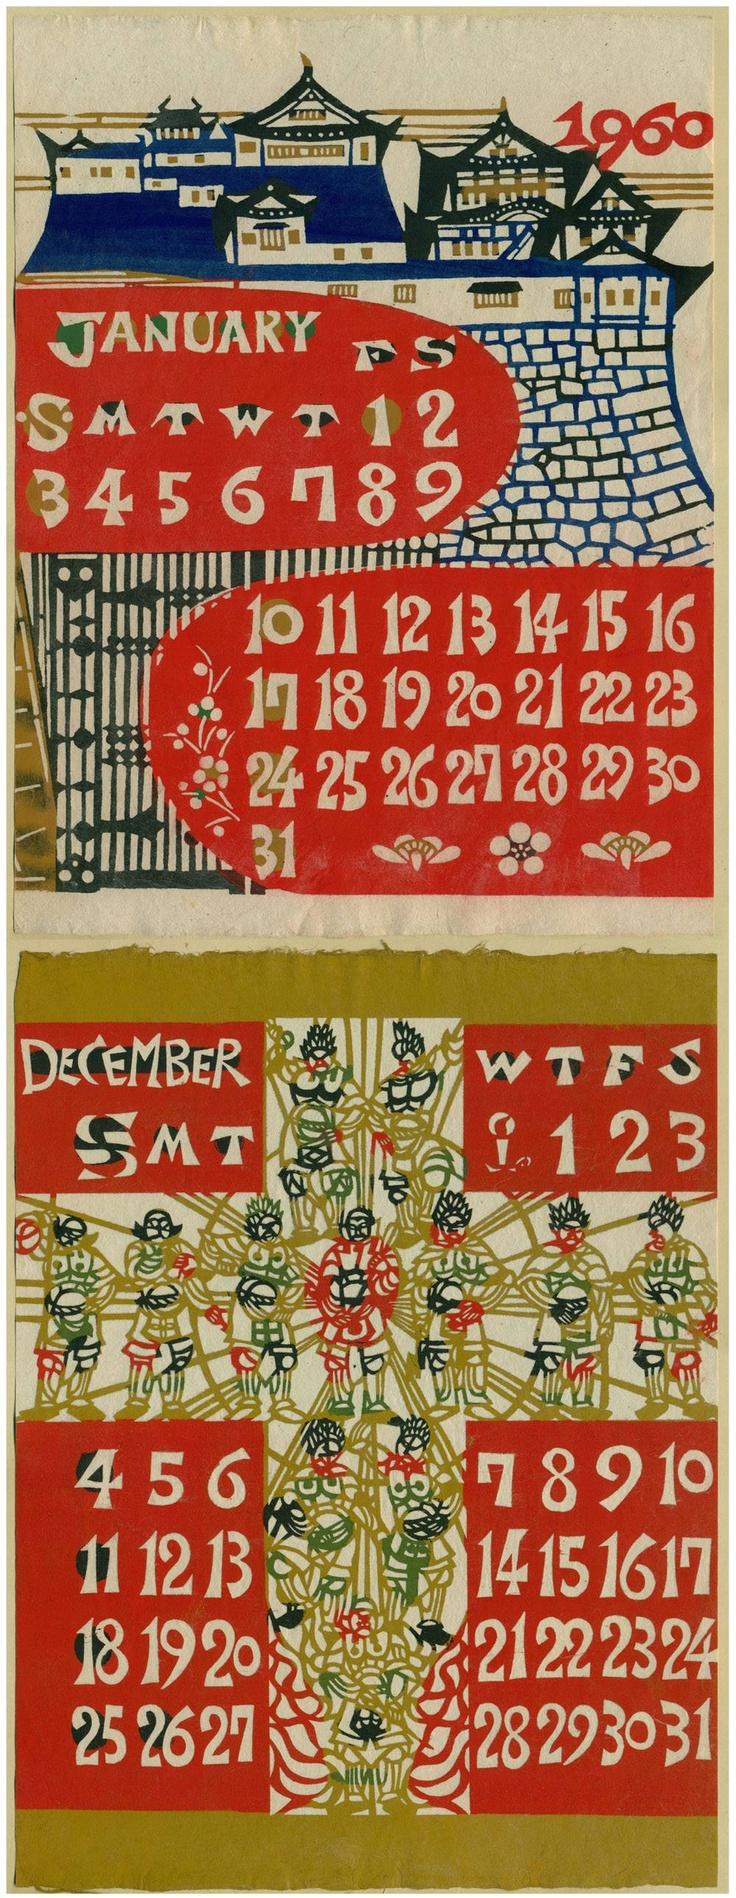 1960 calendar - Keisuke Serizawa (芹沢 銈介 Serizawa Keisuke?, May 13, 1895 - April…